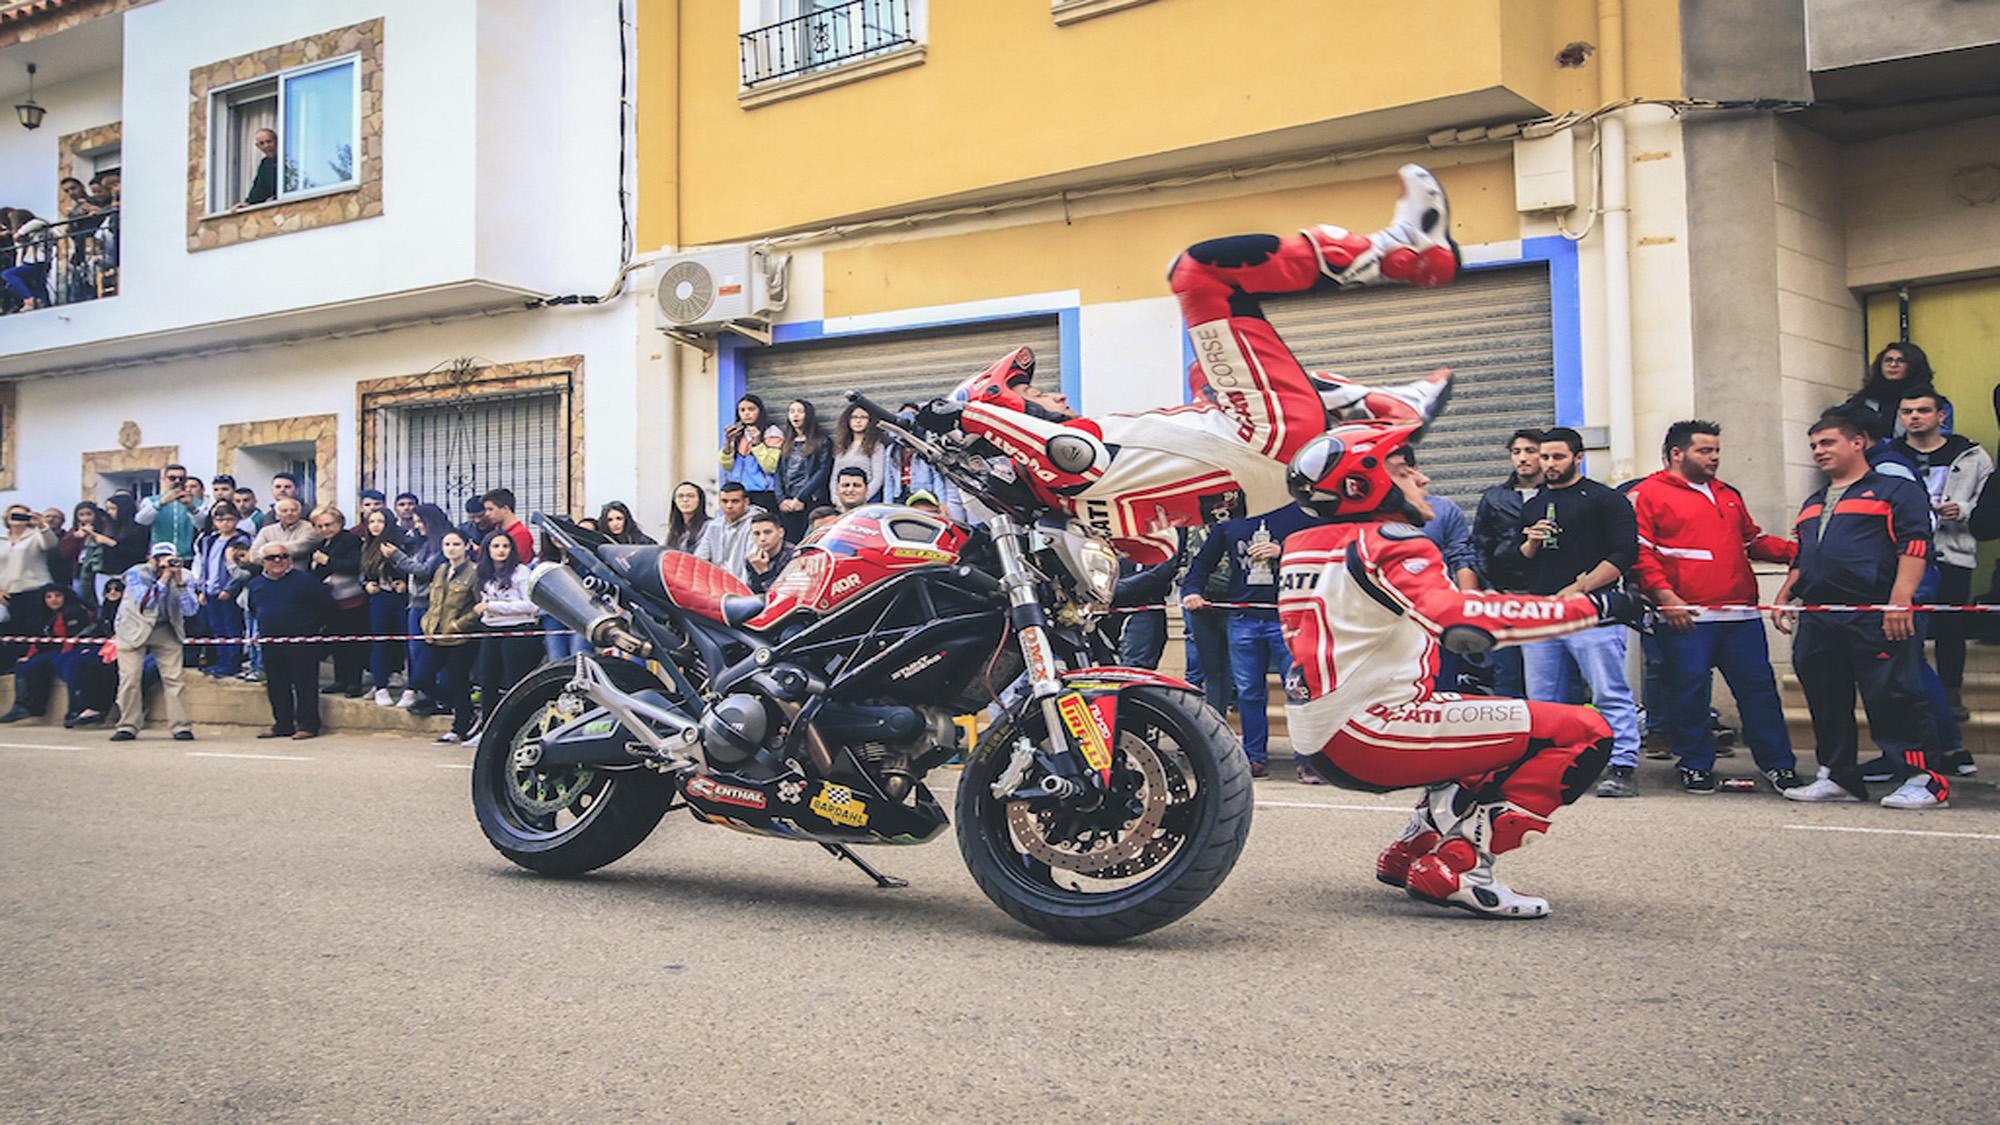 Ducati Stunt Show